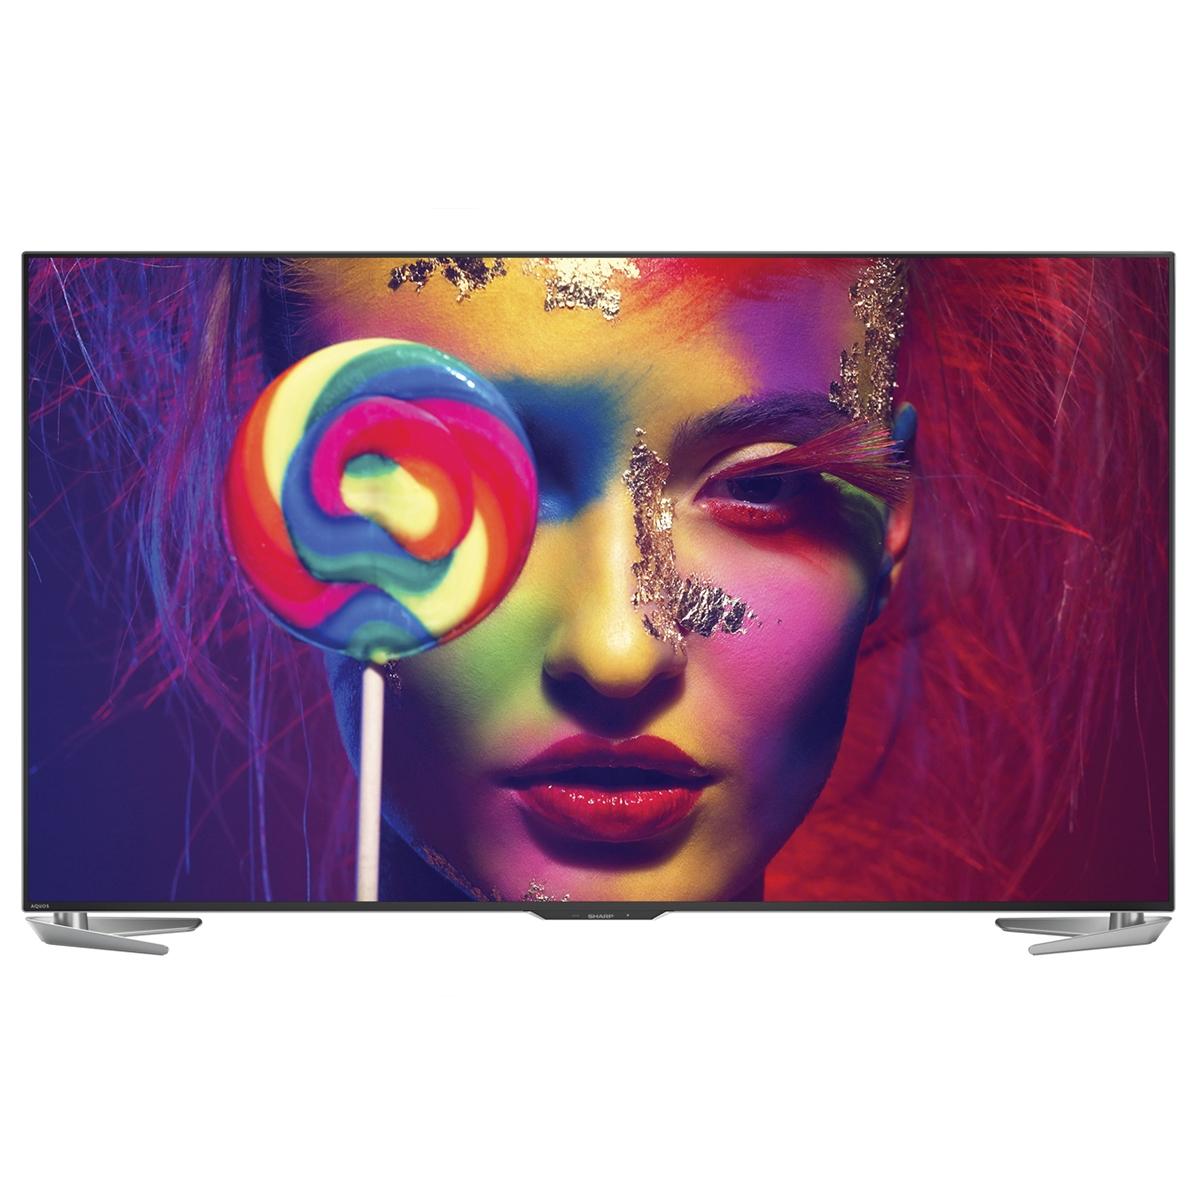 Sharp AQUOS 70inch LED 4K Ultra HDTV - LC-70UH30U